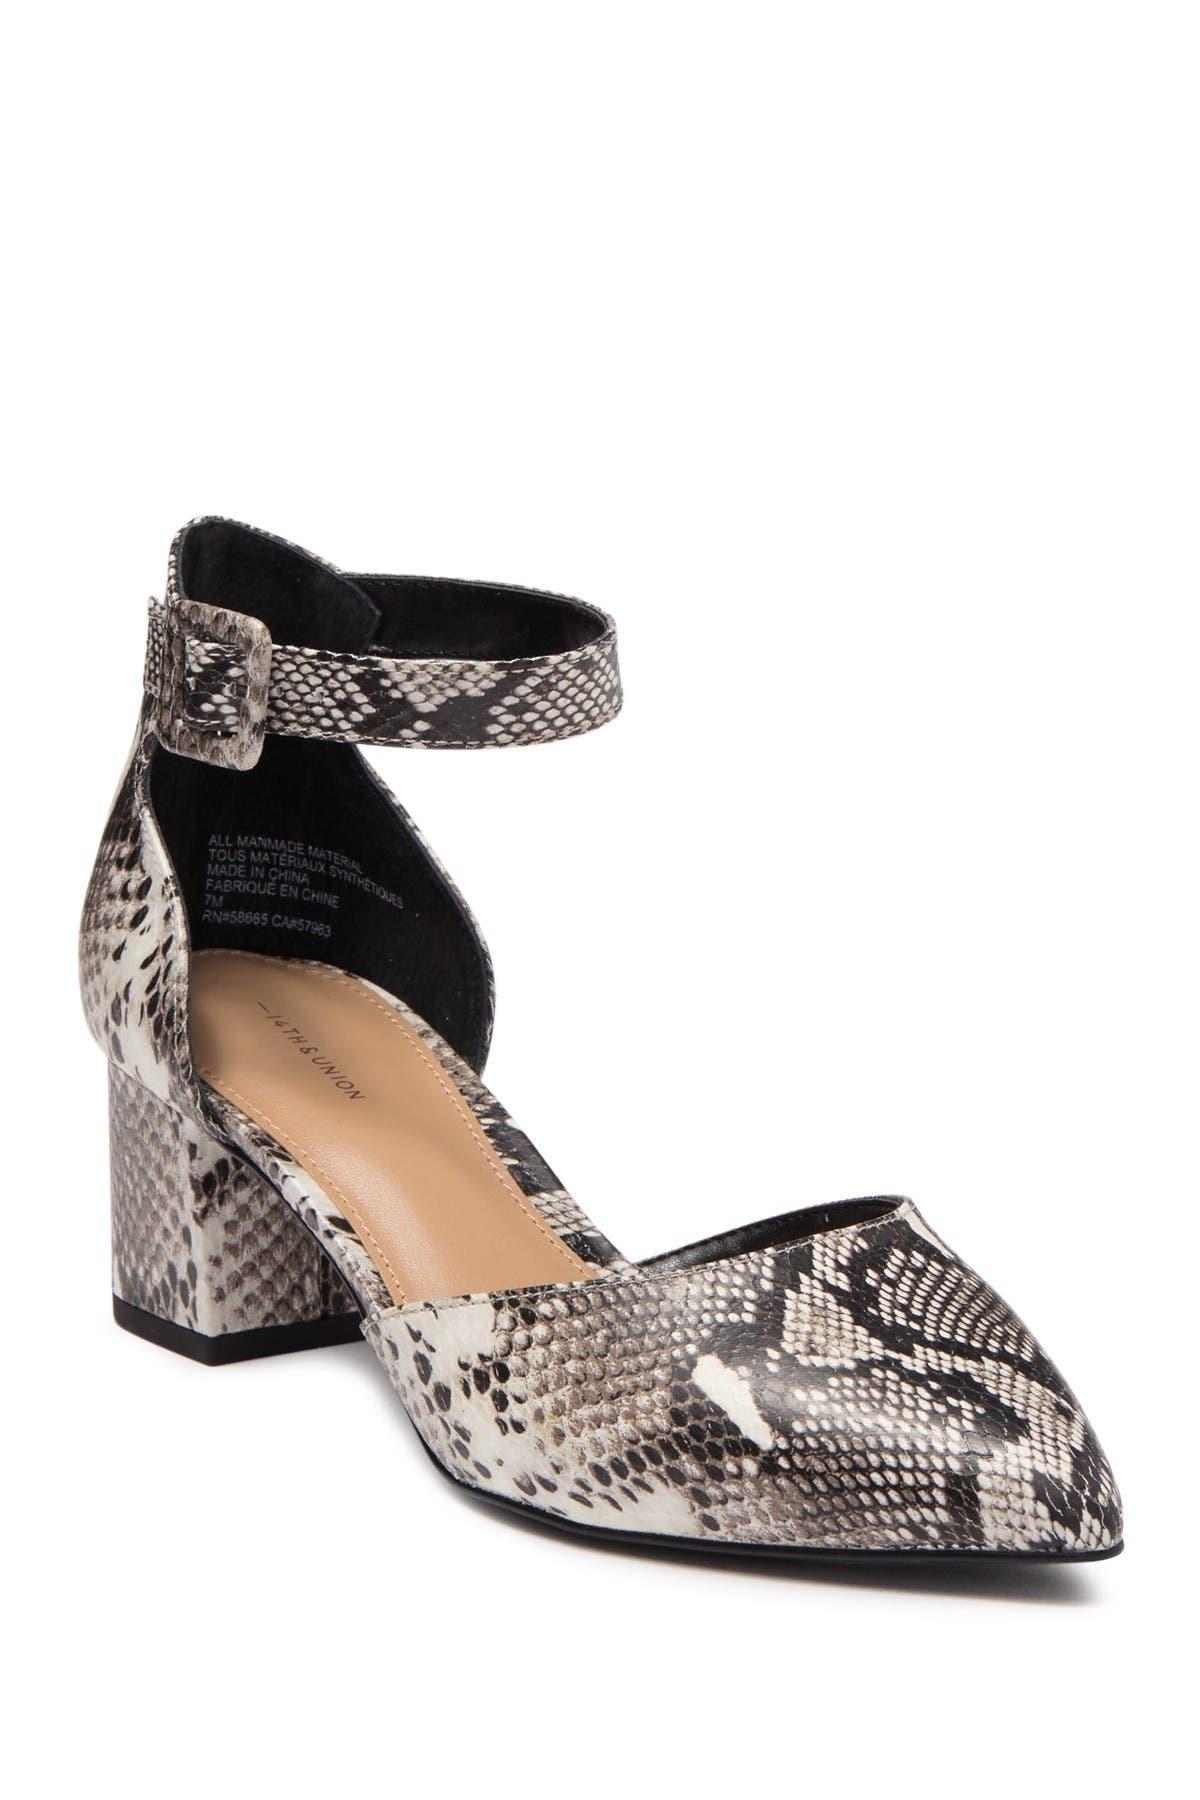 NEW Sonoma Women/'s Raelin Buckle Strap Block Heeled Sandals #132642 142P tk